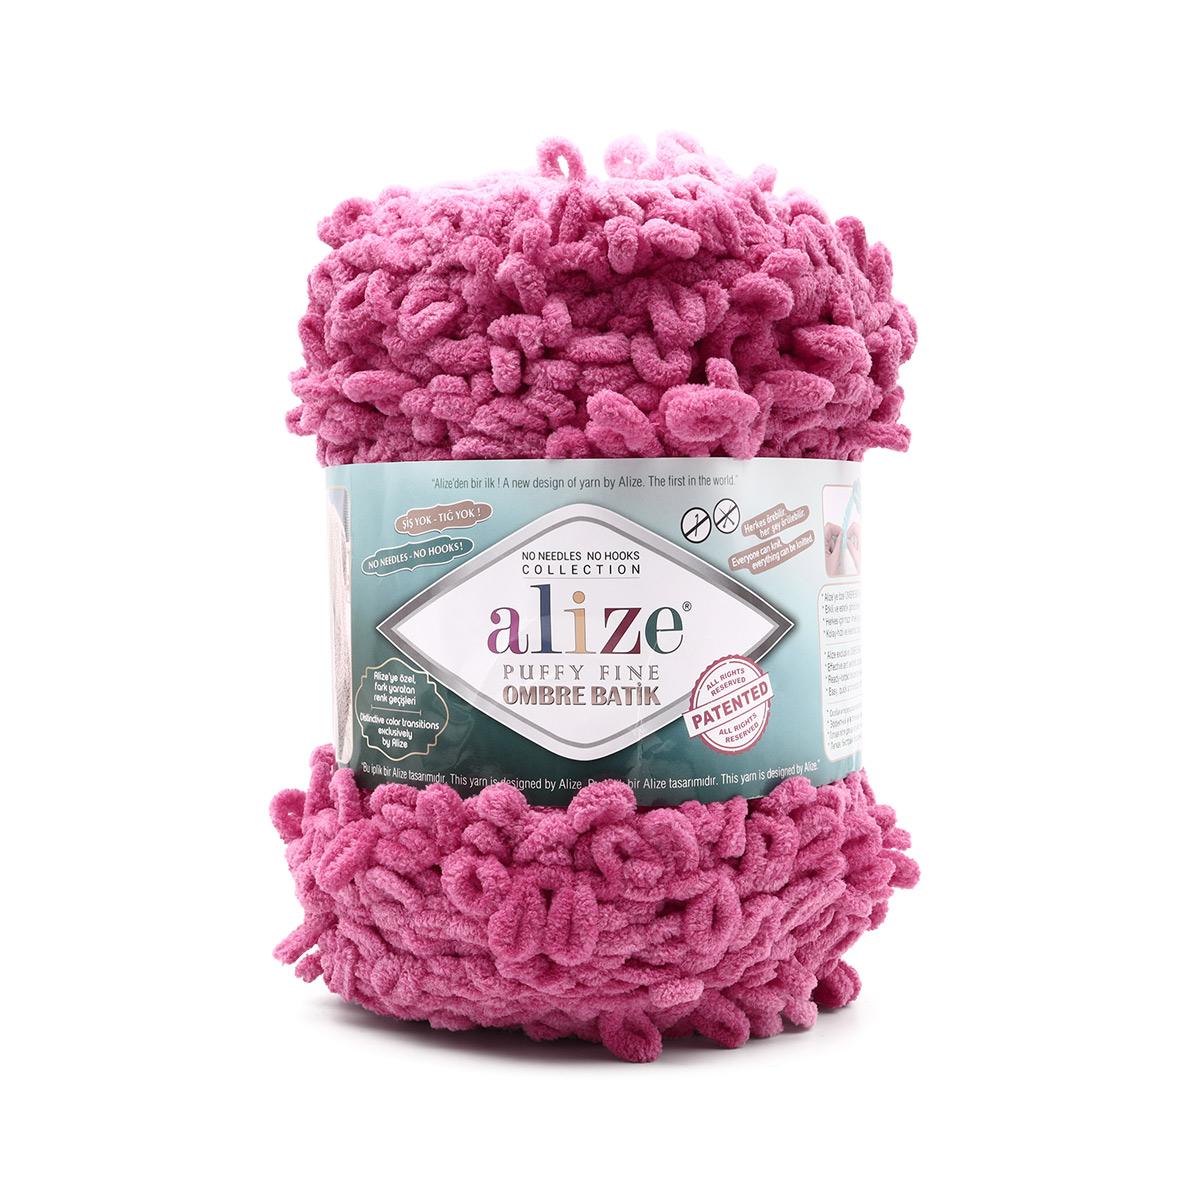 Пряжа Alize 'Puffy Fine Ombre Batik' 500гр. 73м. (100% микрополиэстер)